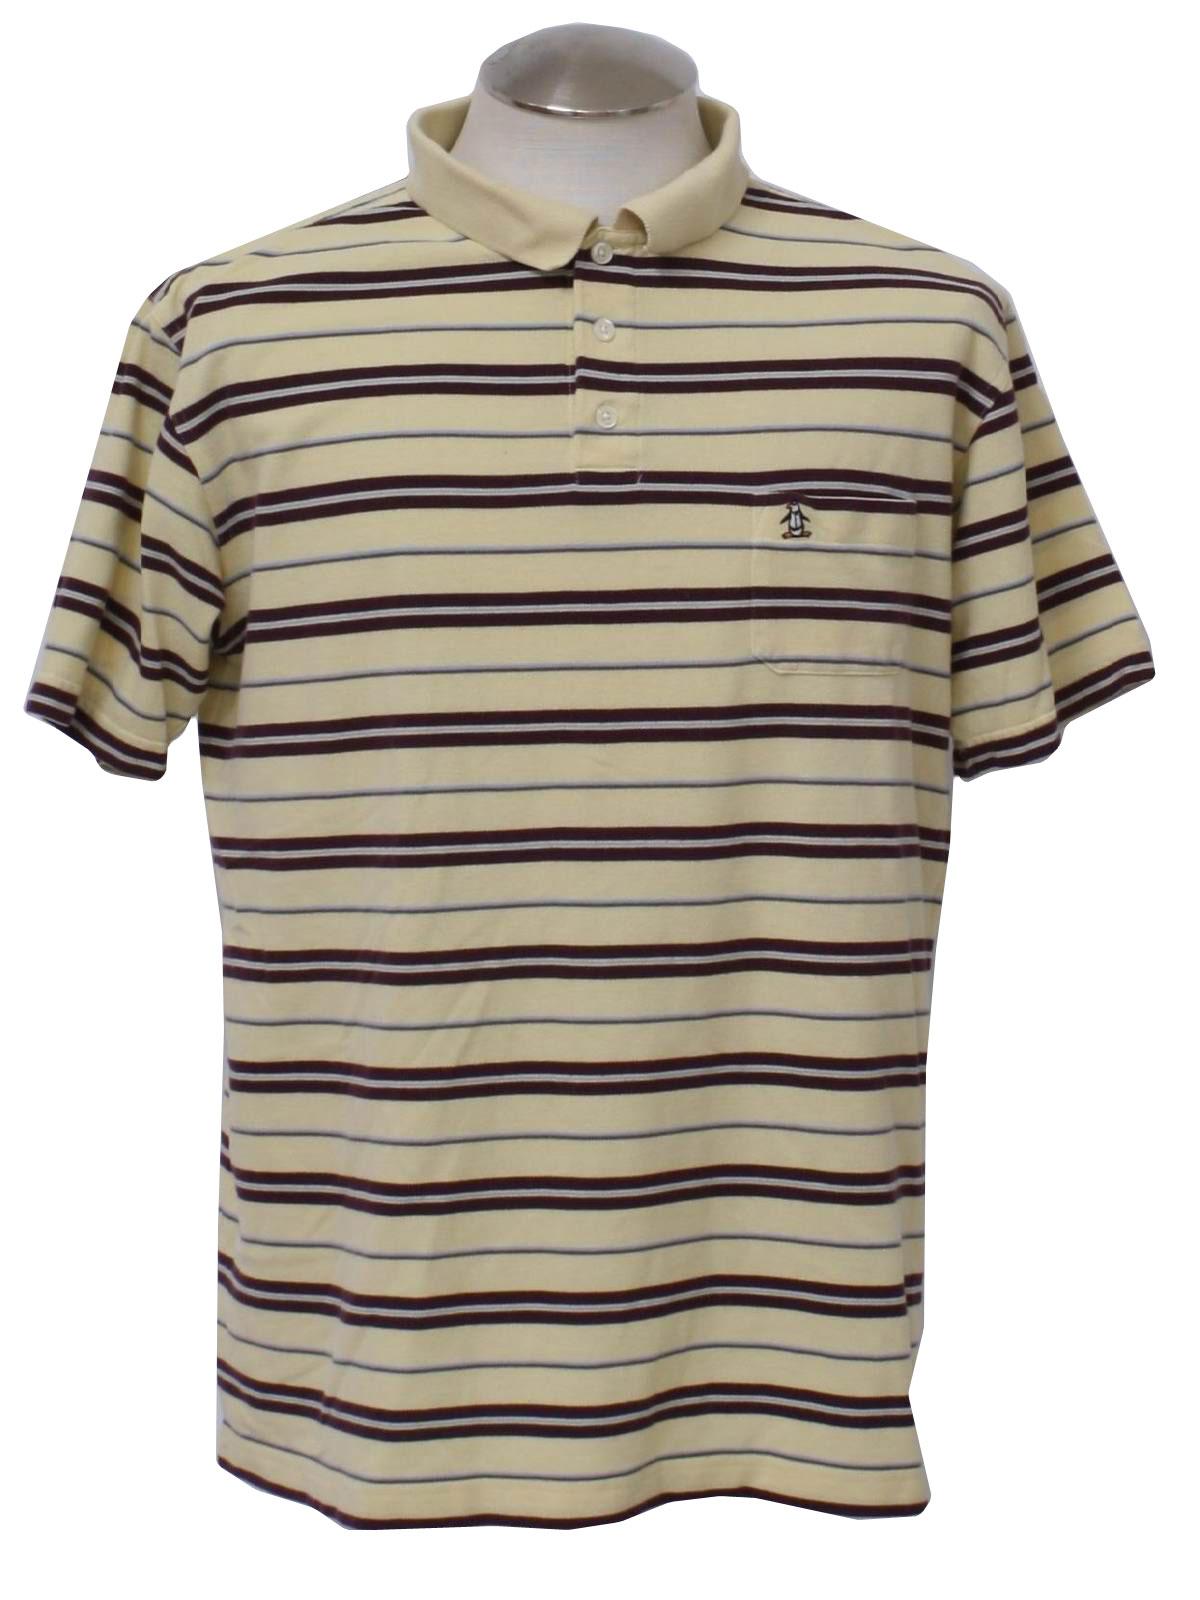 Retro 1980s shirt 80s penguin by munsingwear mens maize for Golf shirt with penguin logo